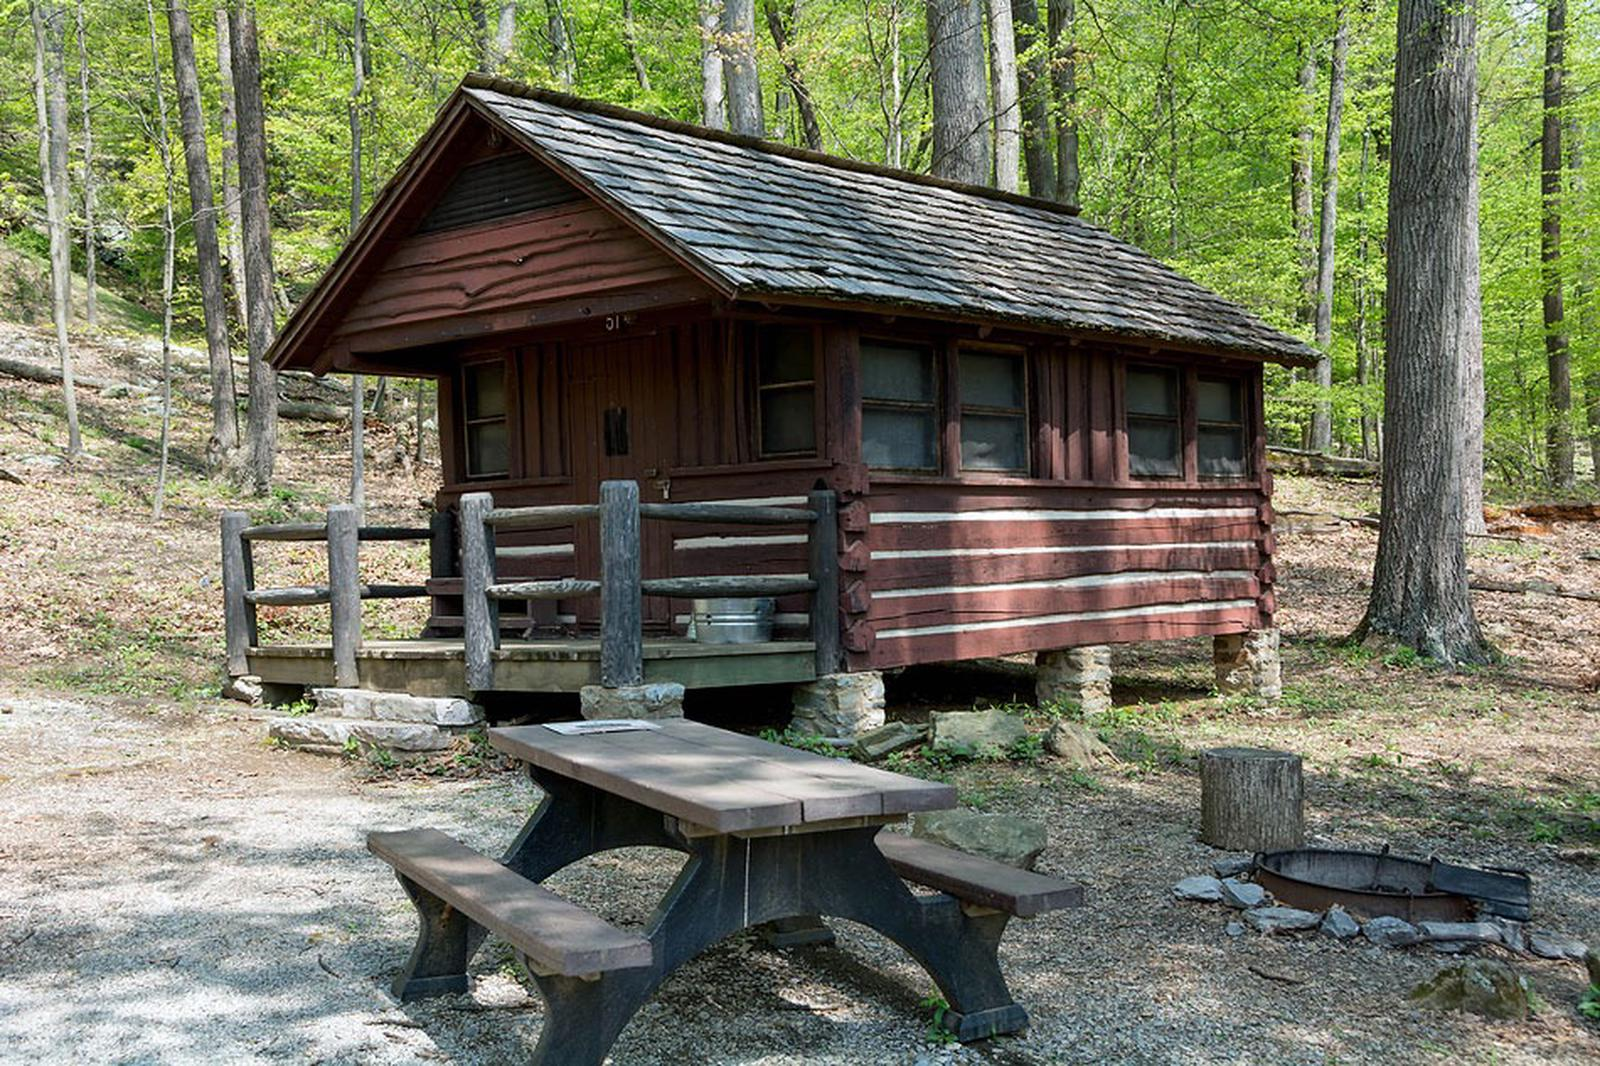 Camp Misty Mount Cabin 51